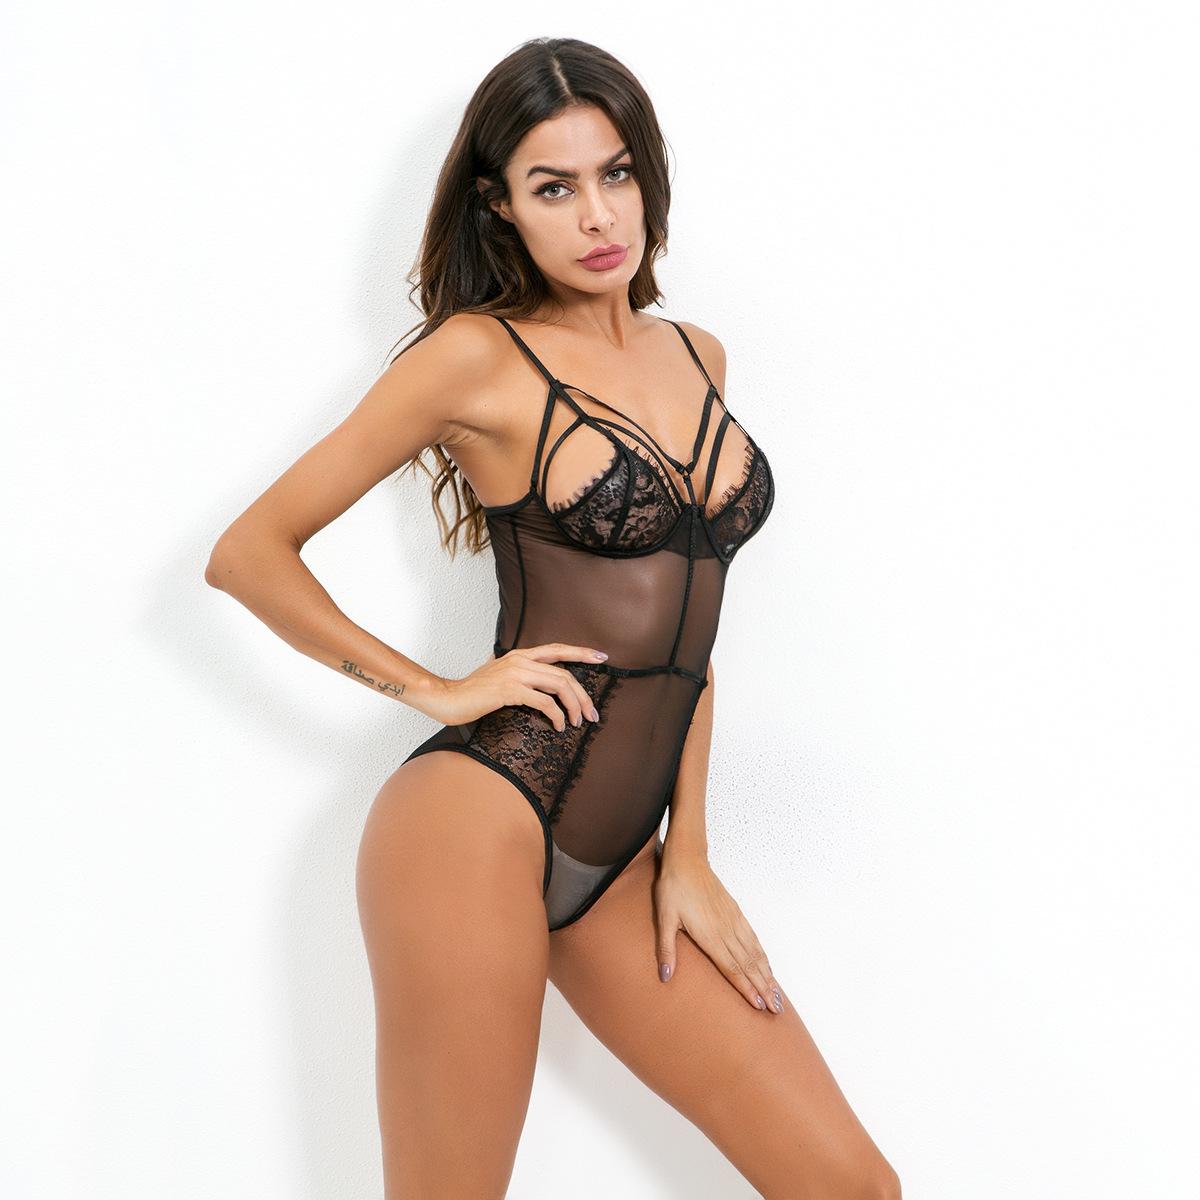 Sabrina sweet porn scenes pics on evilangel